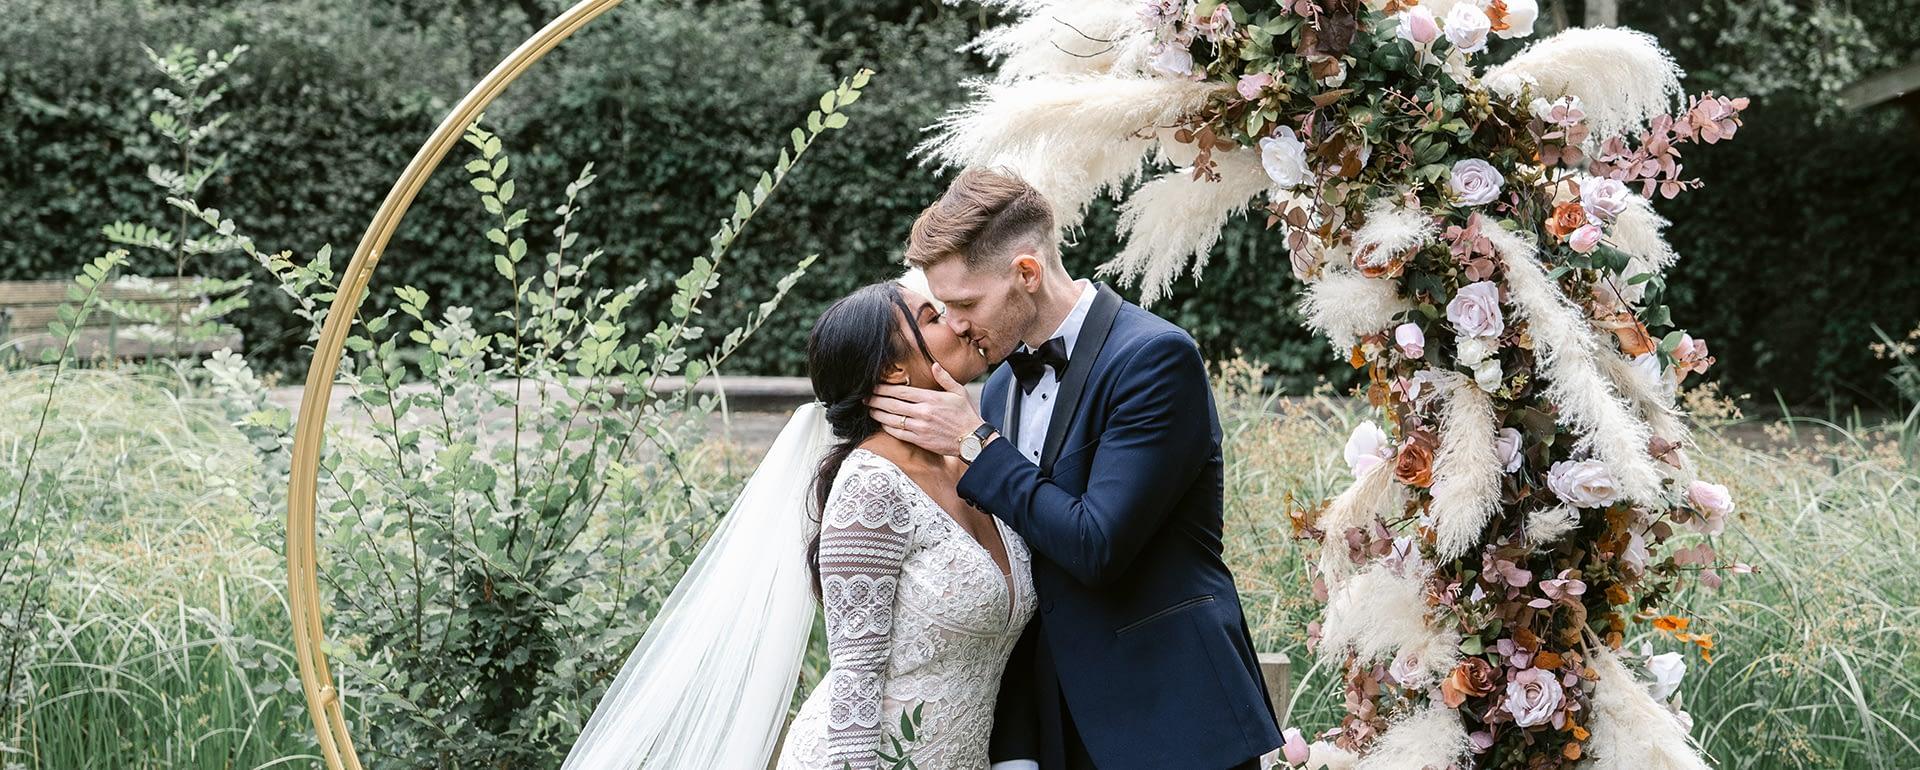 Autumnal Boho Wedding Inspiration at Oakfield Gardens